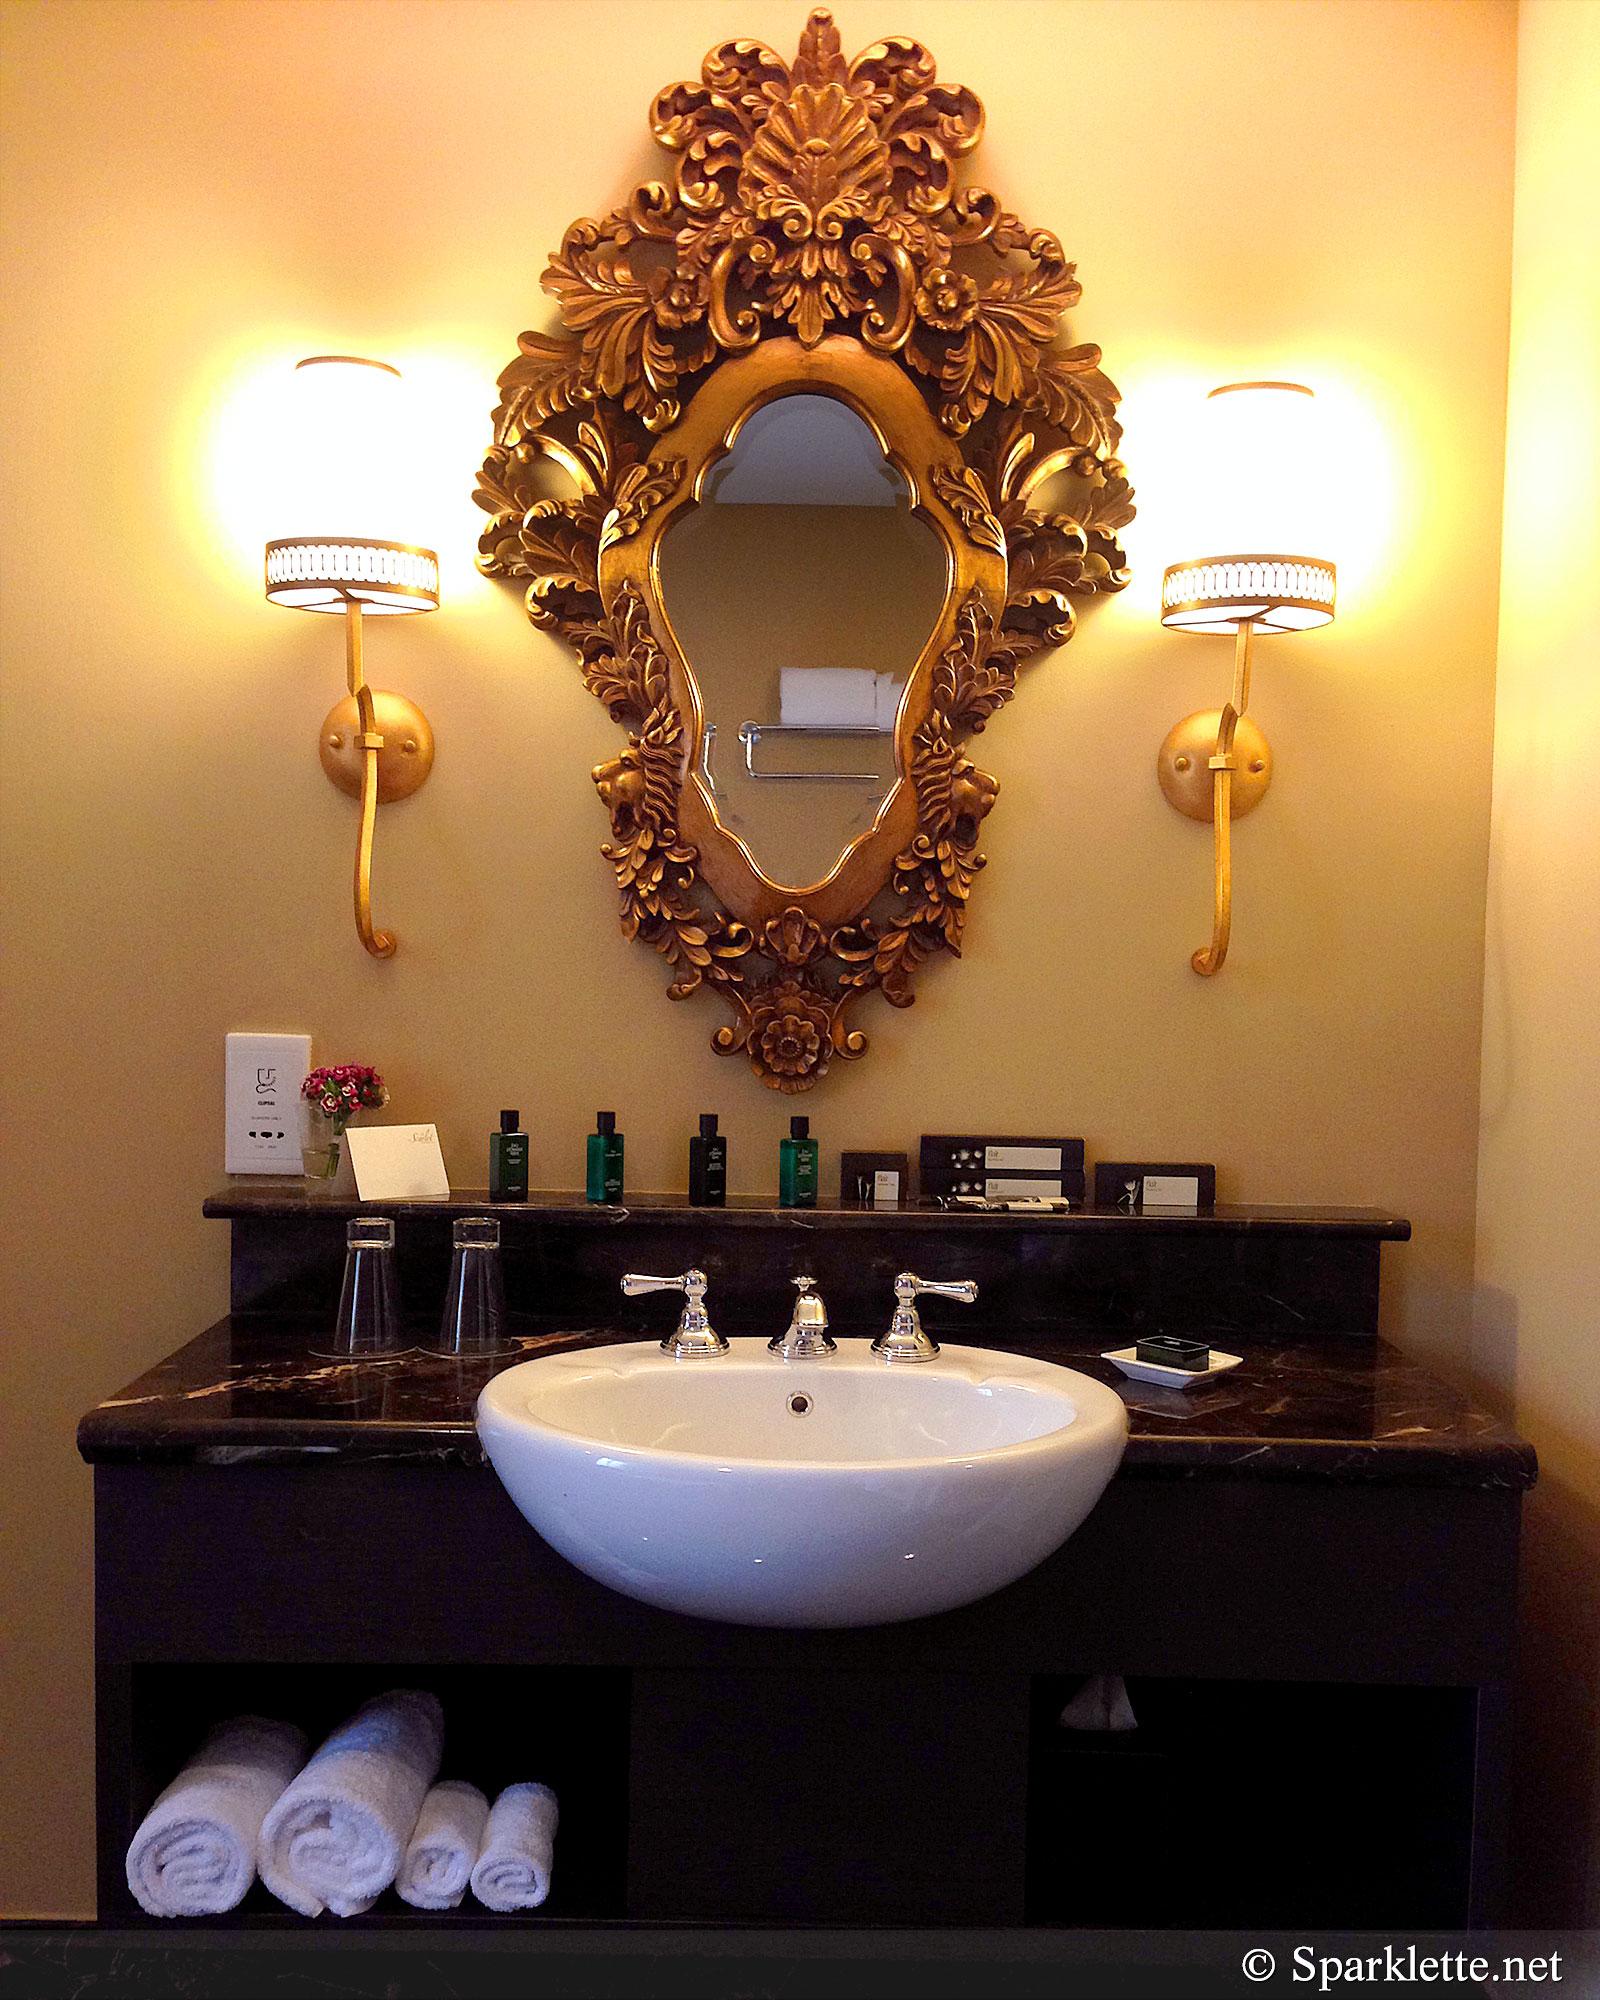 The Scarlet Hotel Splendour Suite Bathroom 2